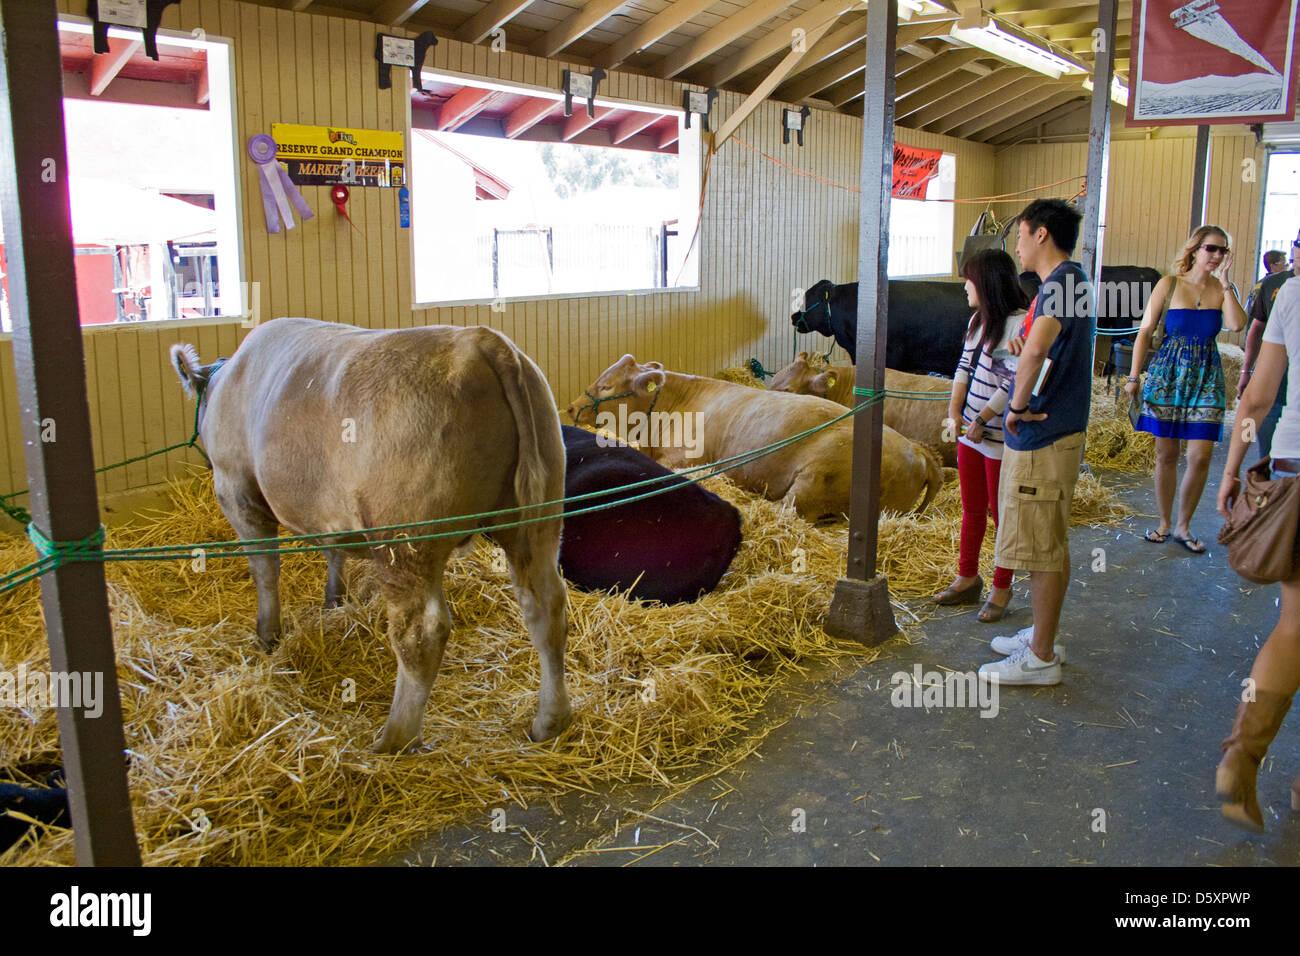 Livestock Auction at Orange County Fair, Costa Mesa, Orange County, California - Stock Image